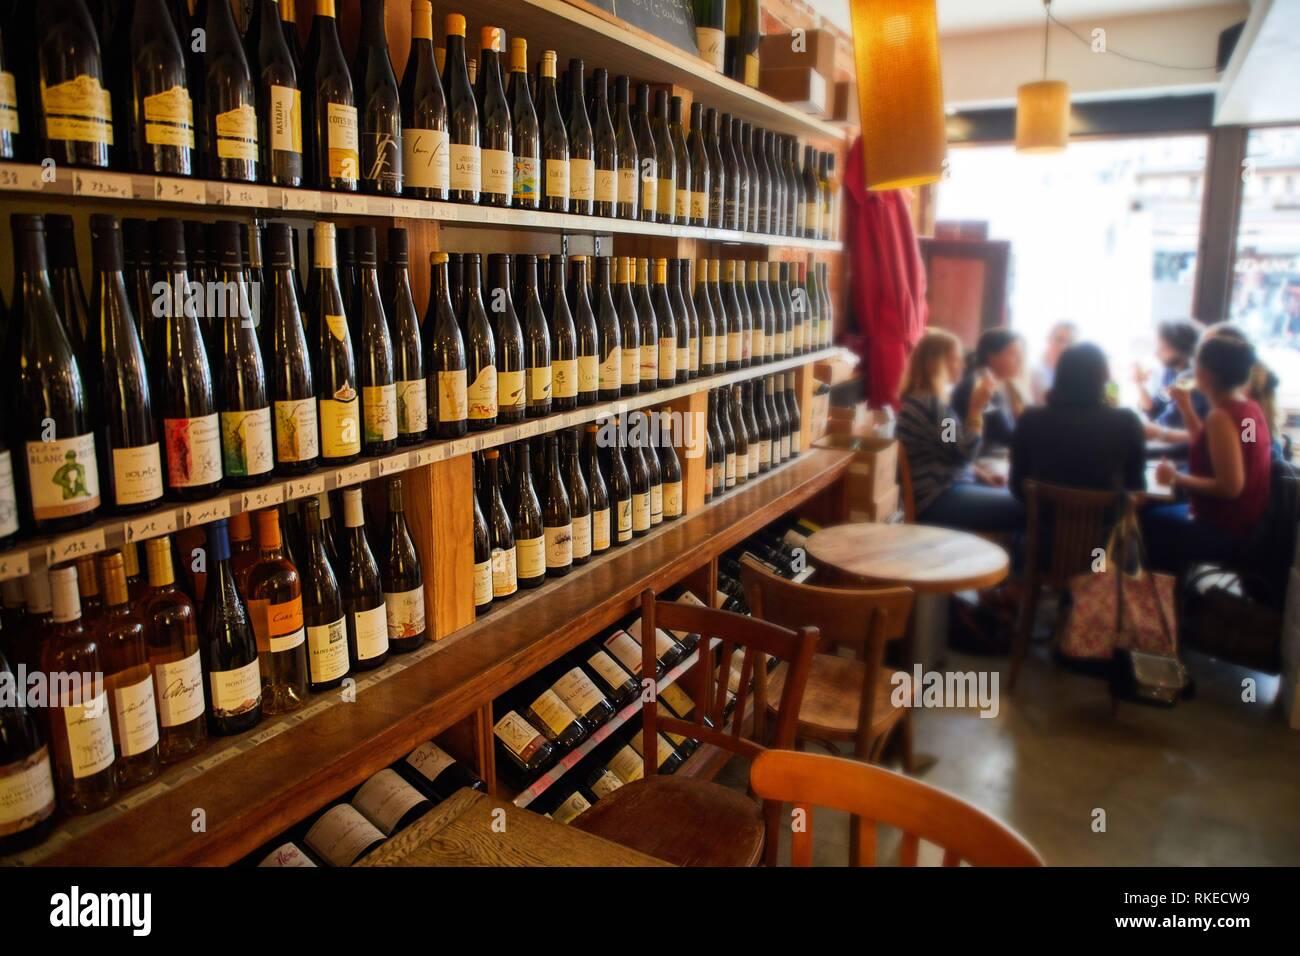 Aux crieurs de vin, wine bar, restaurant, Troyes, Champagne-Ardenne Region, Aube Department, France, Europe - Stock Image